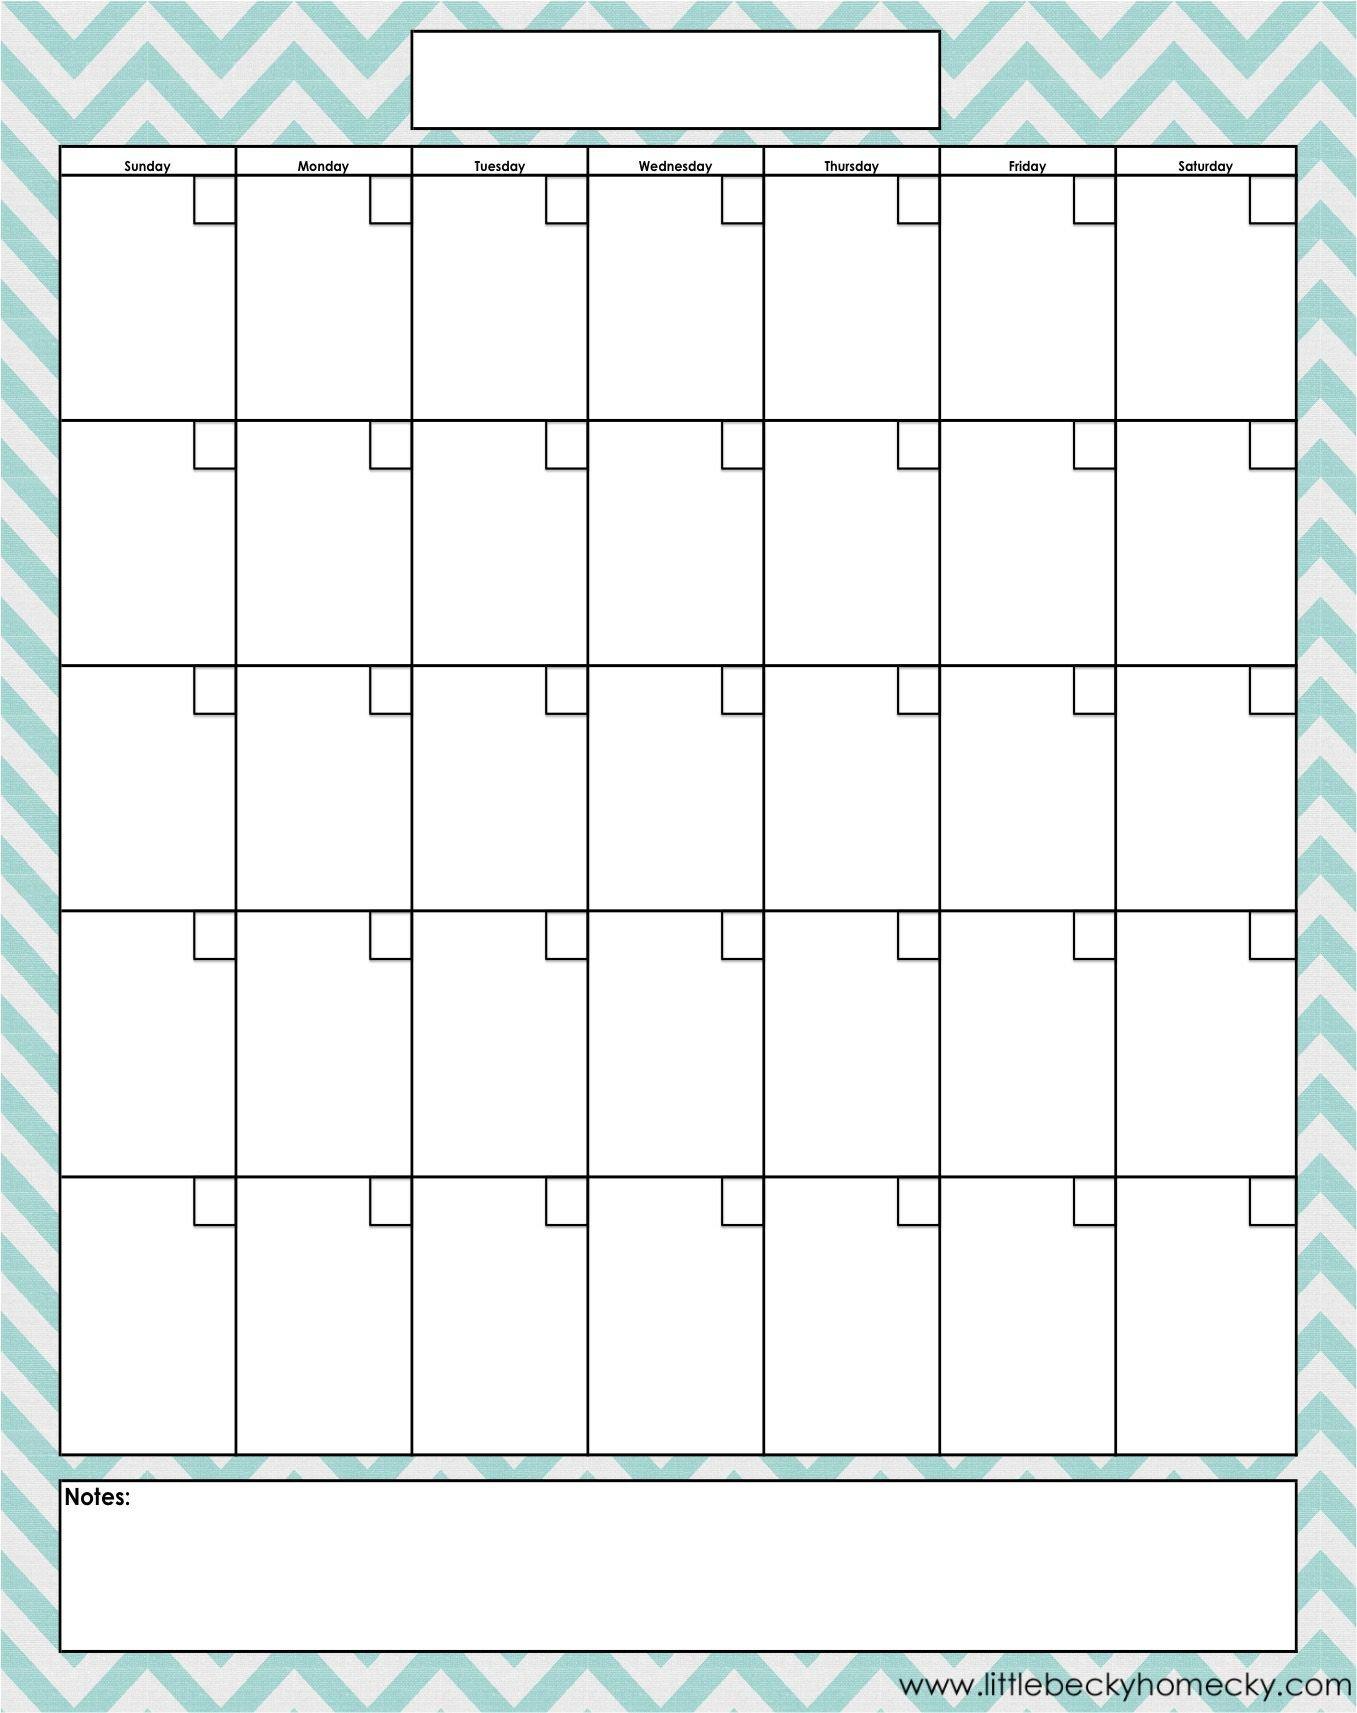 Blank Fill In Calendar | Calendar Template Printable Free Printable Fill In Calendars